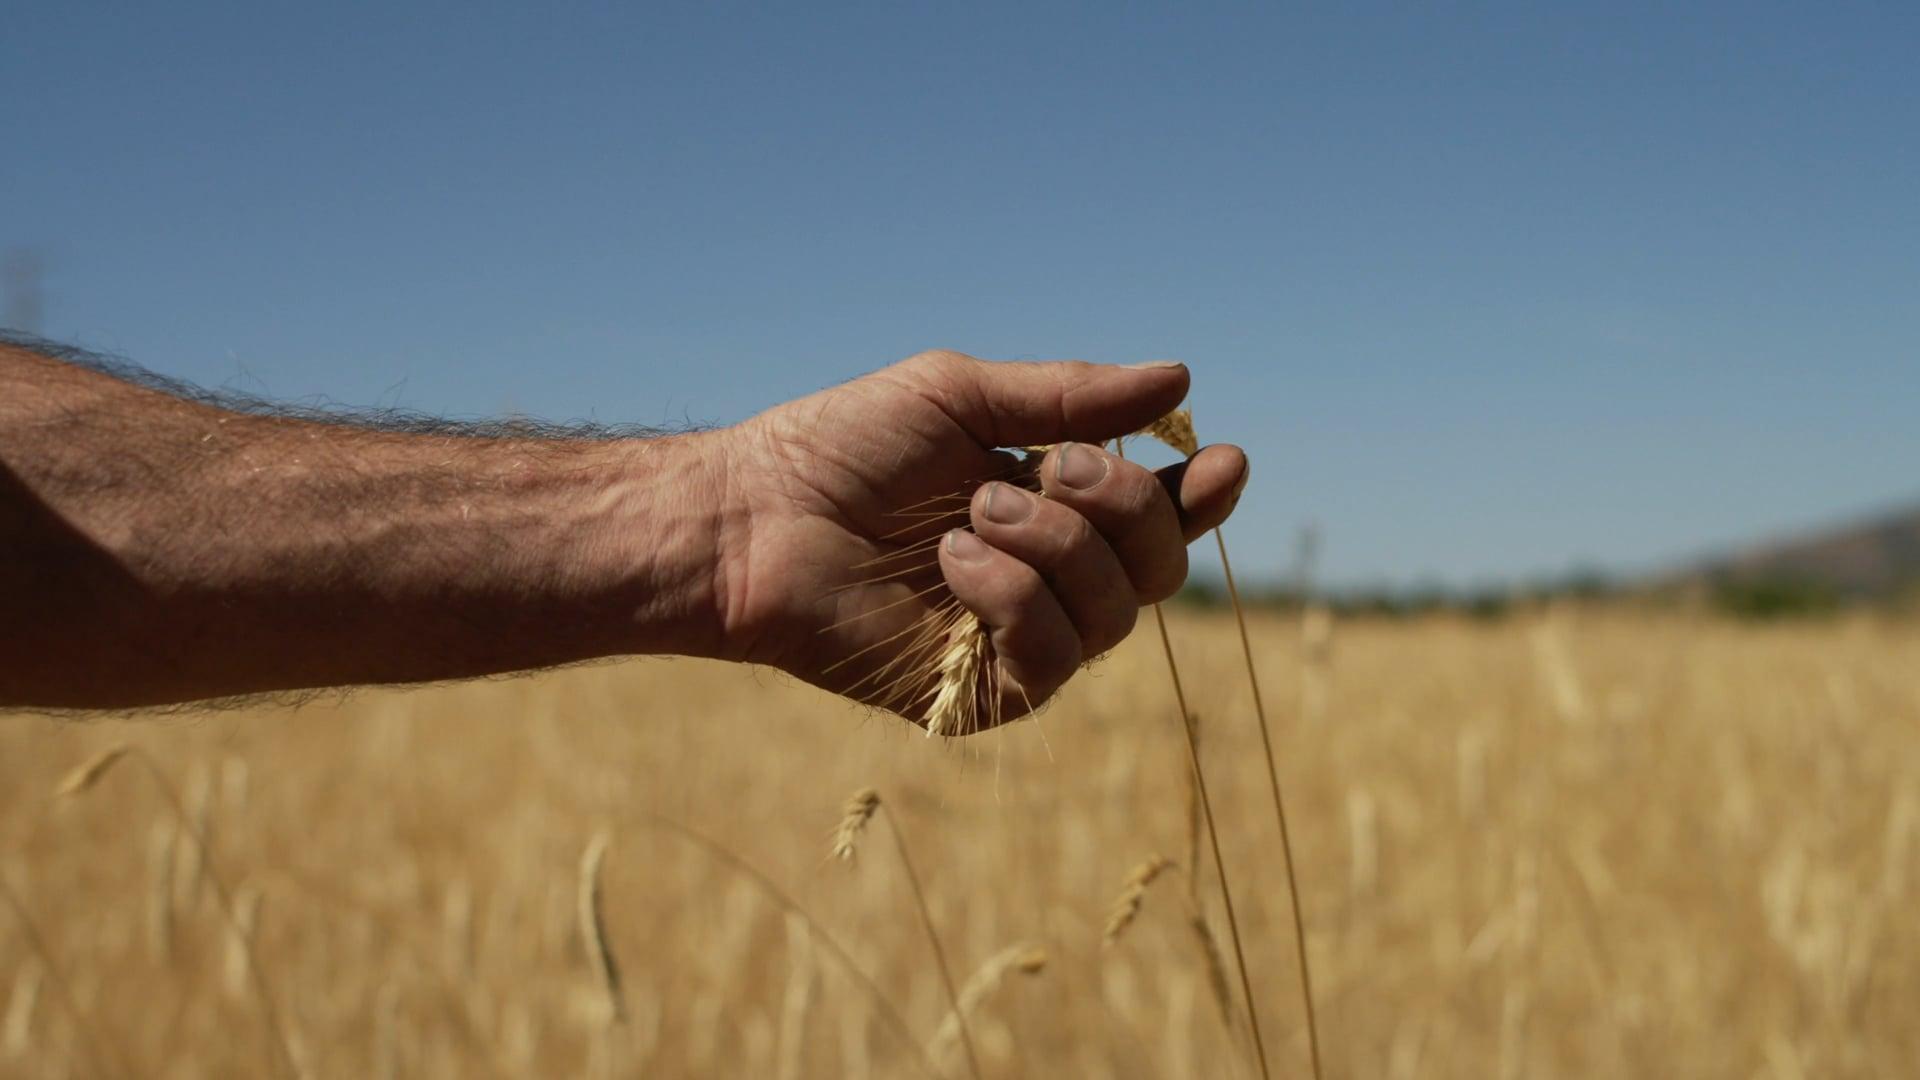 Alex Weiser- Tehachapi Grain Project